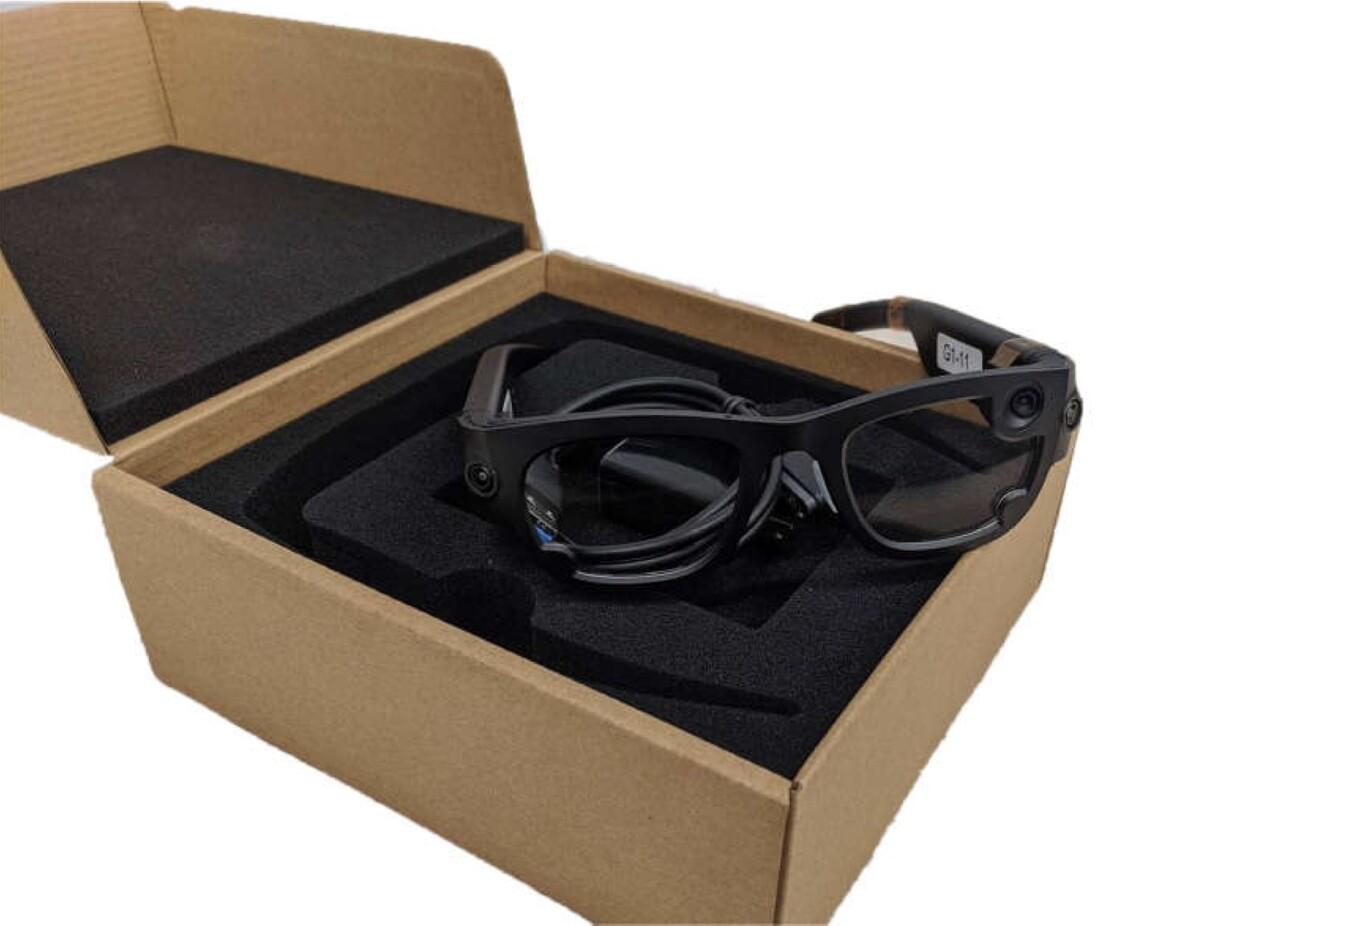 Caja Con Gafas Inteligentes